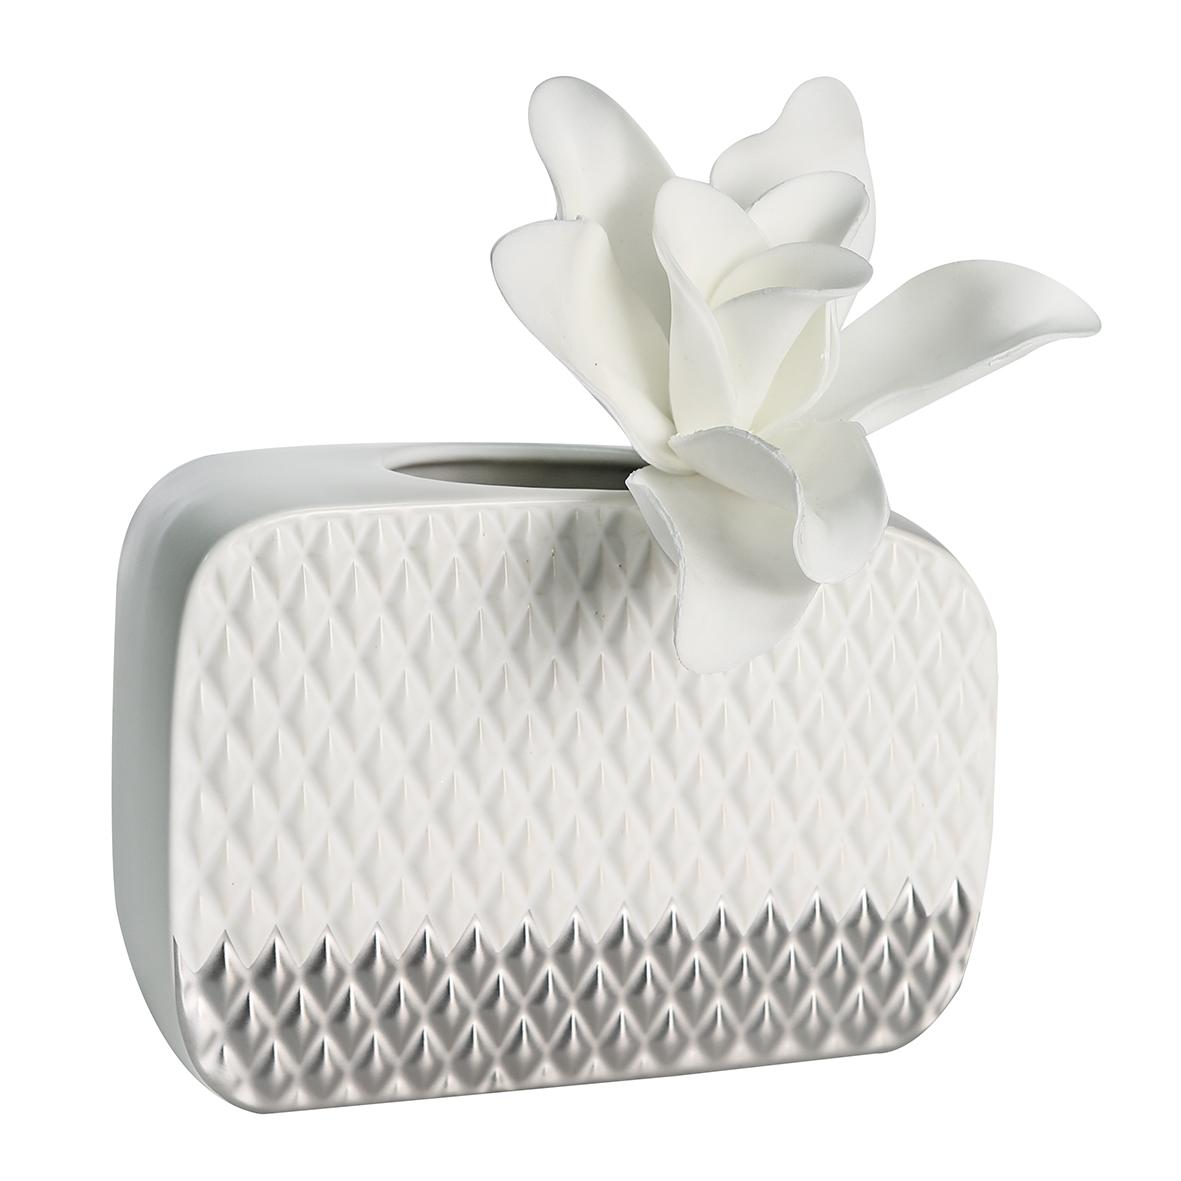 Váza Anil, 29 cm, bílá / stříbrná